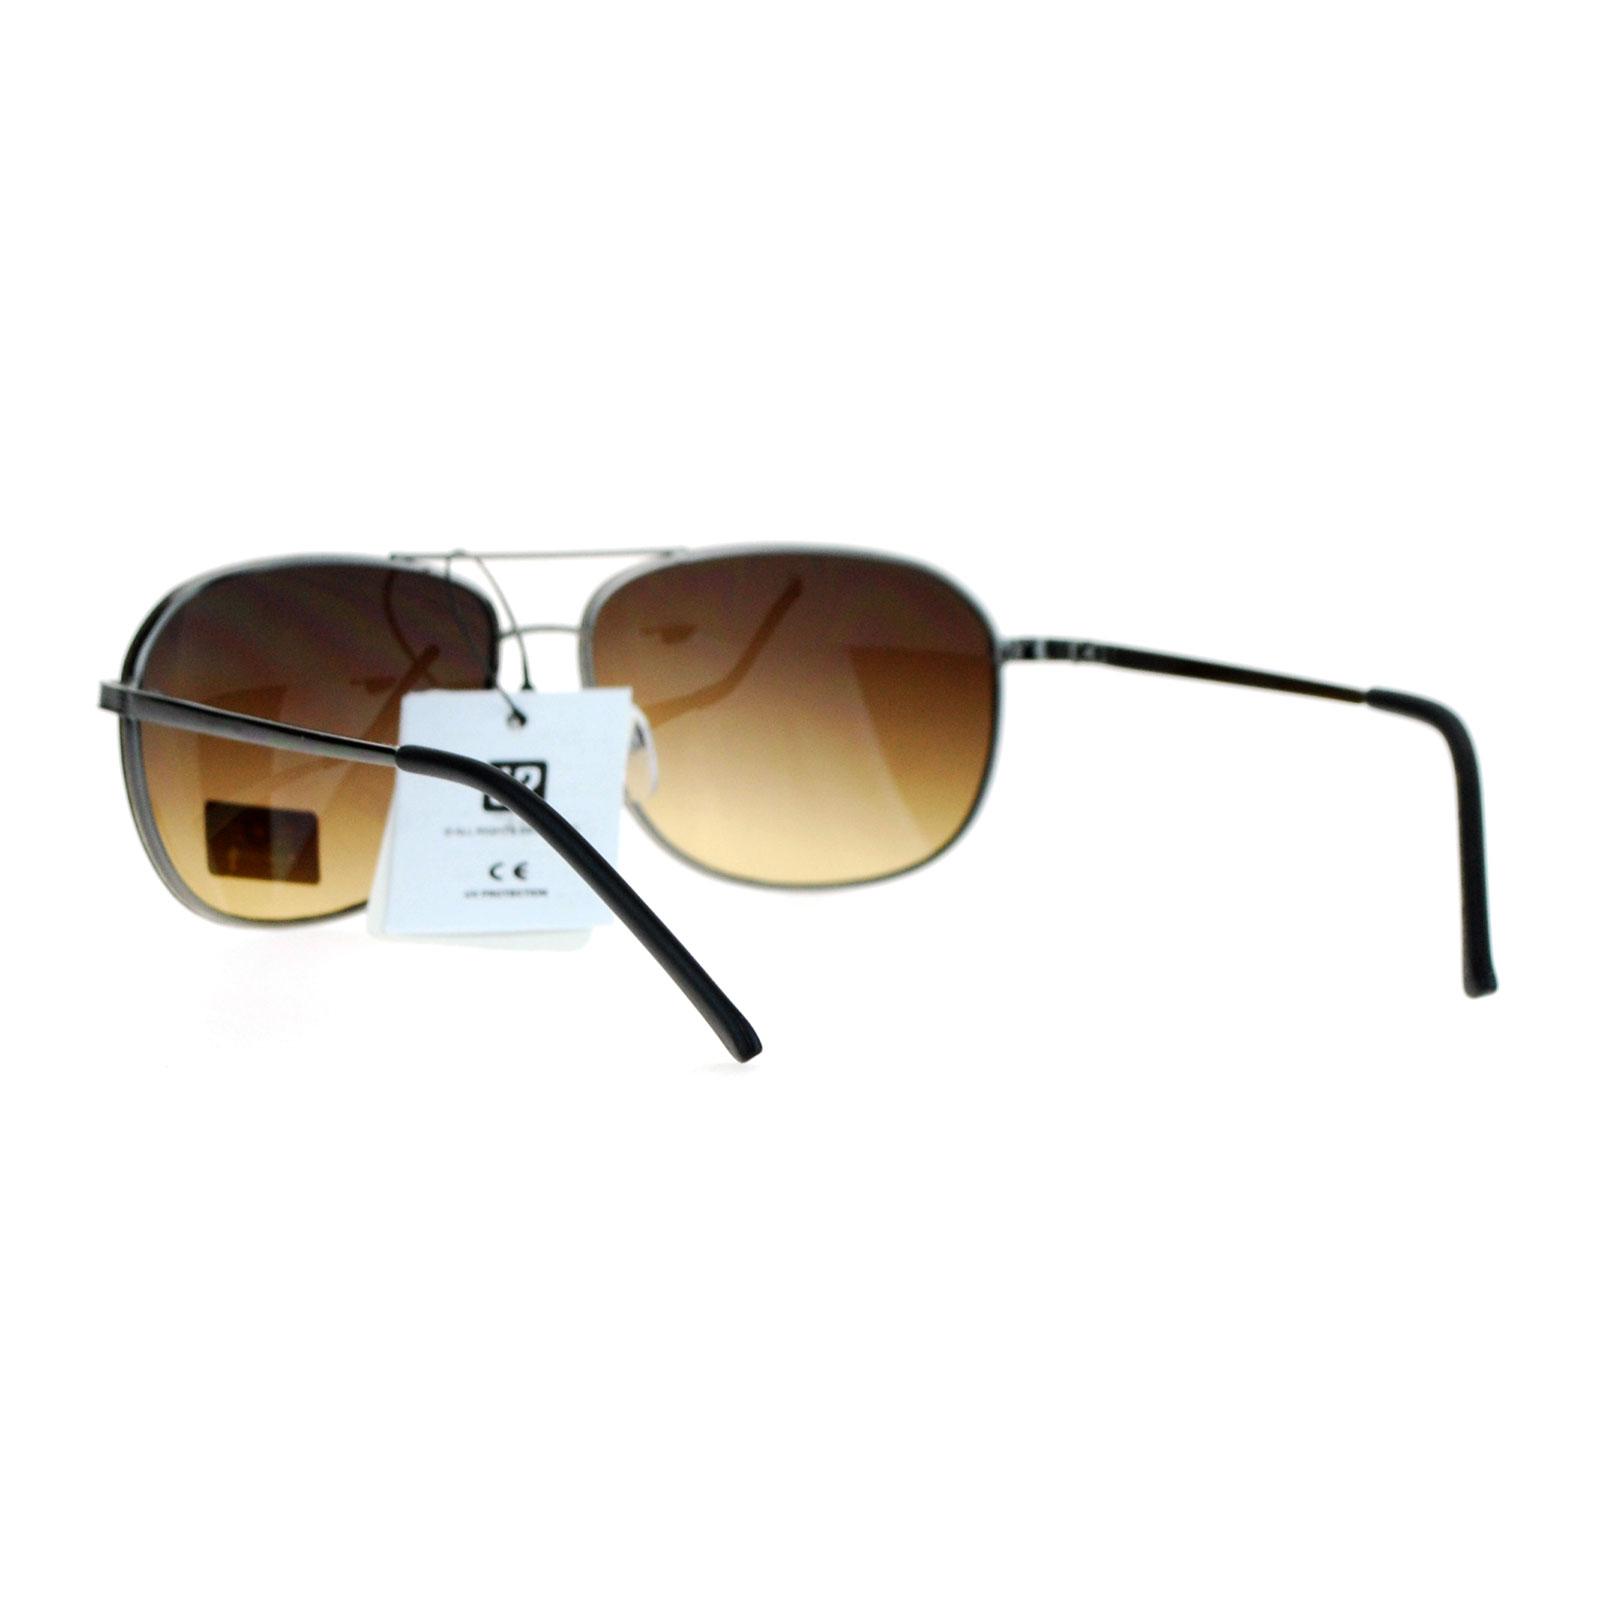 2a152fc17abb Rimless Aviator Sunglasses Men